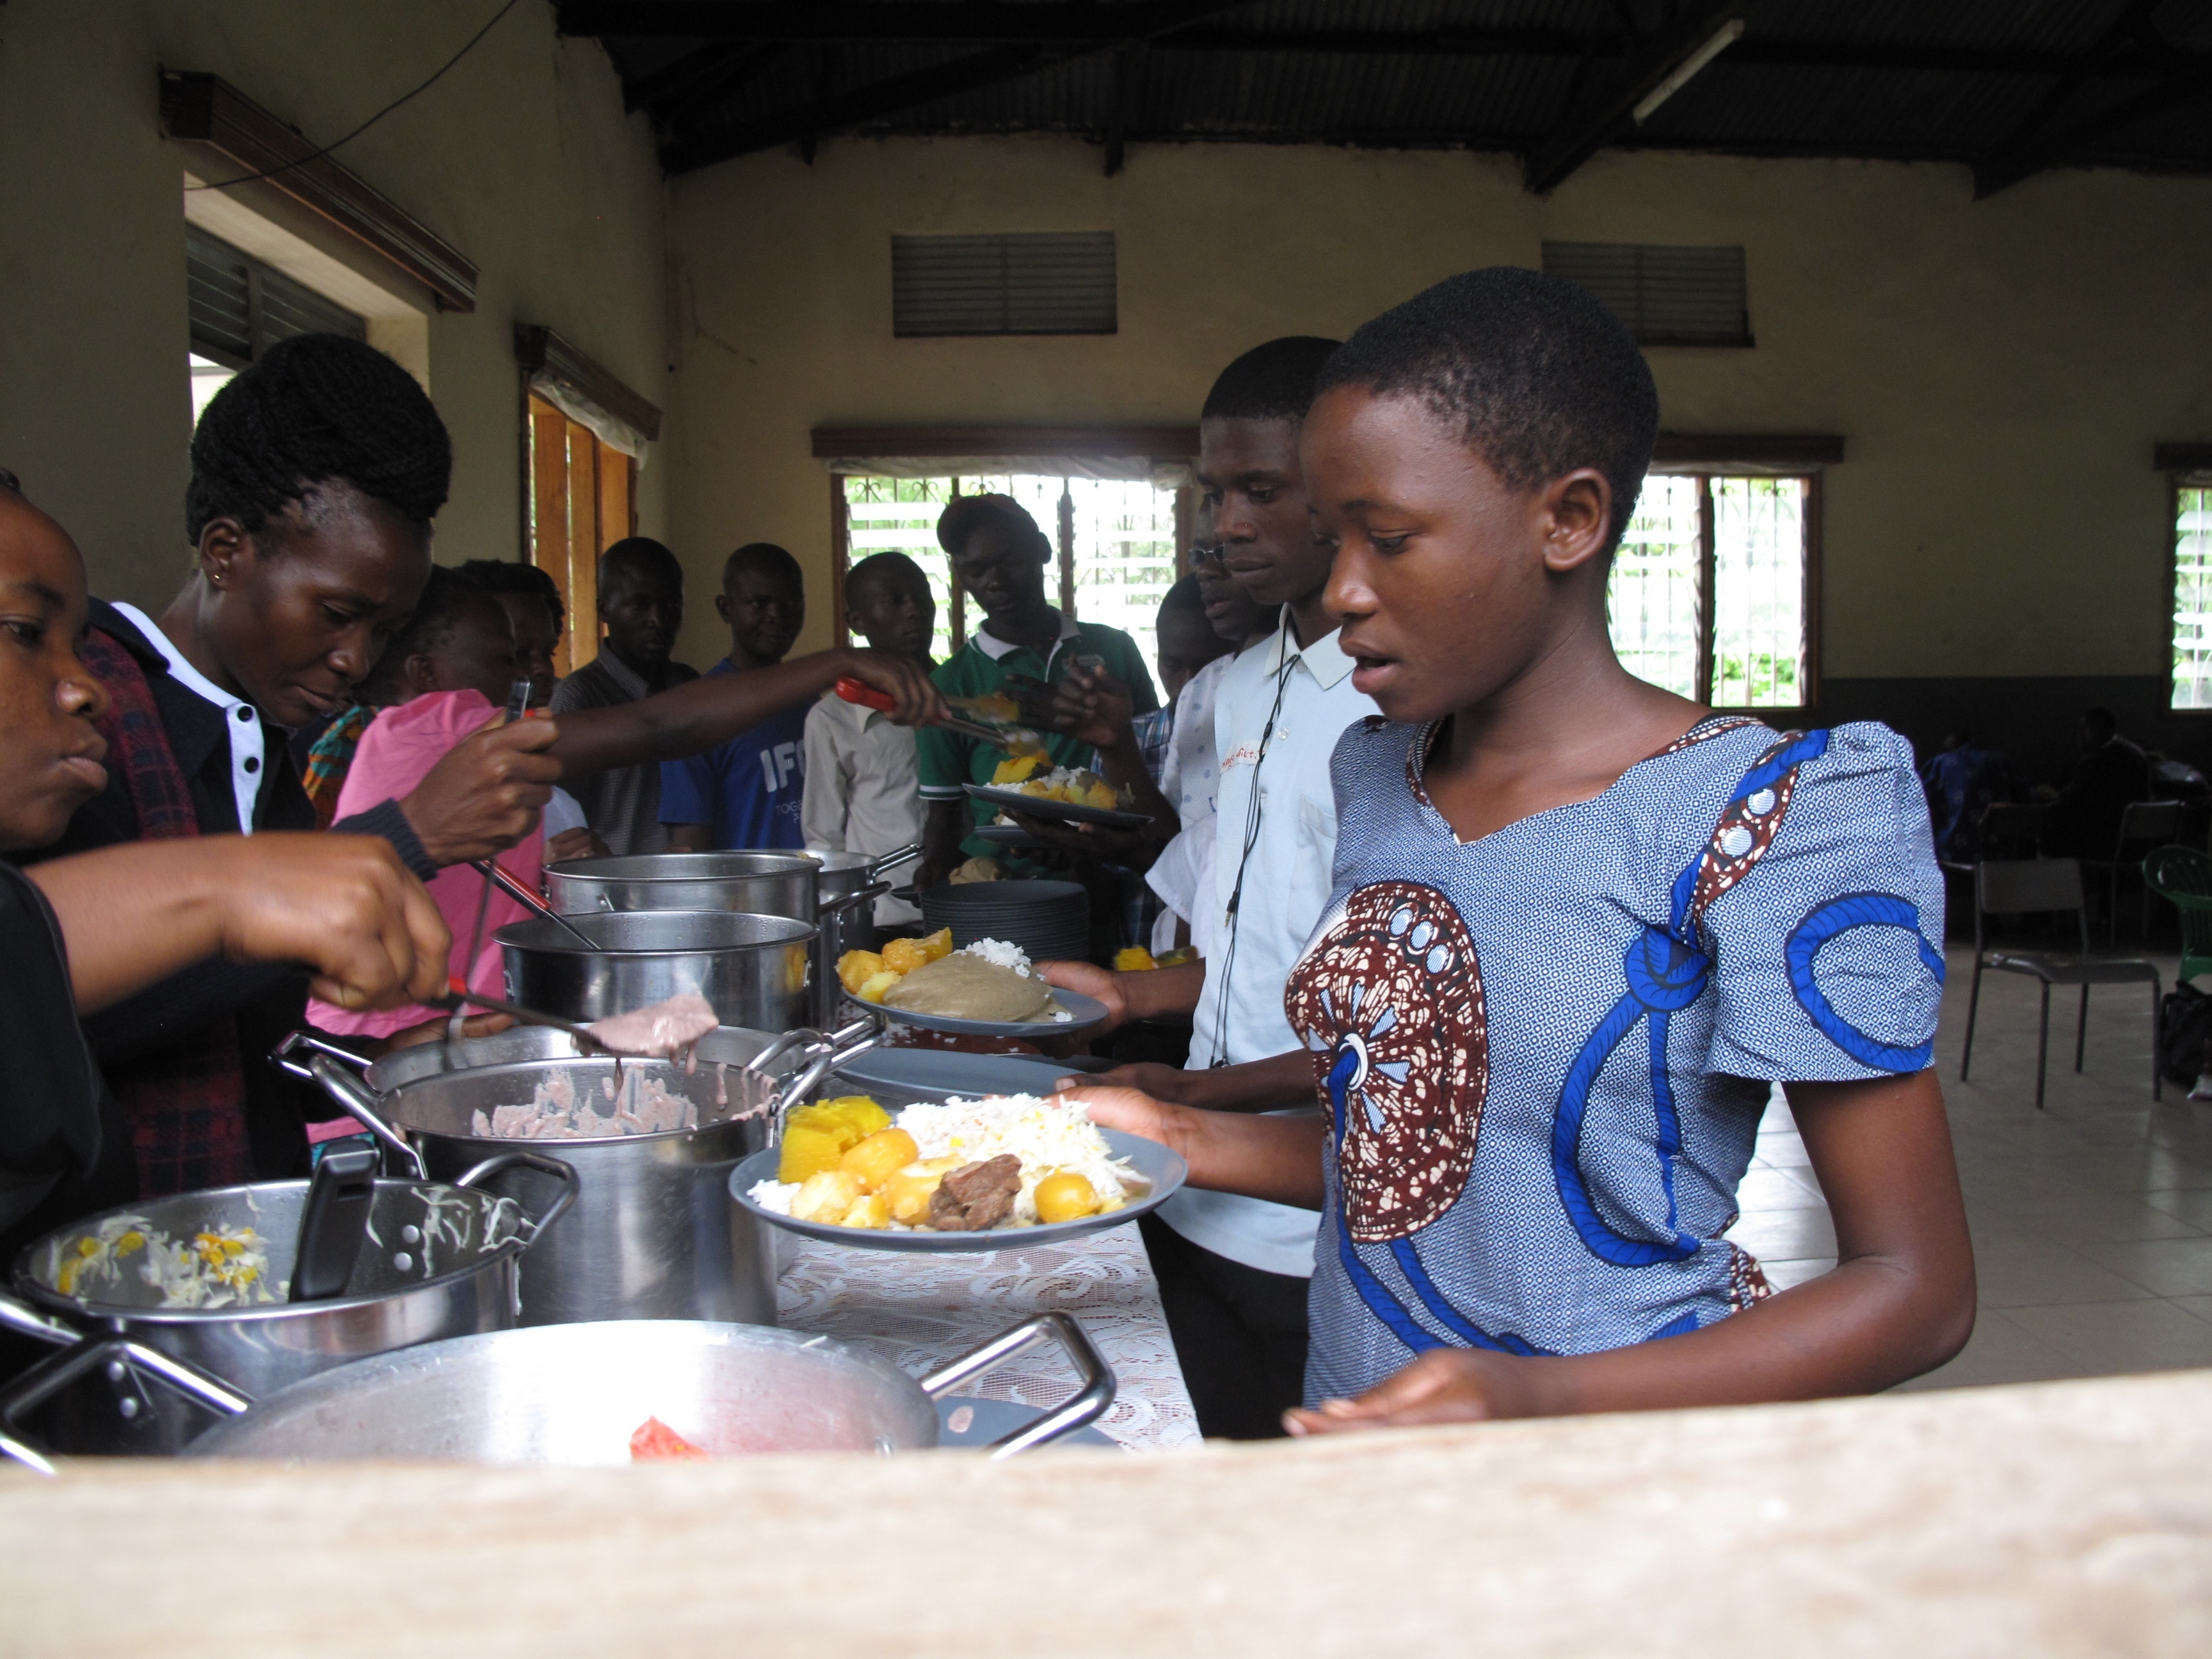 Children having lunch in Uganda